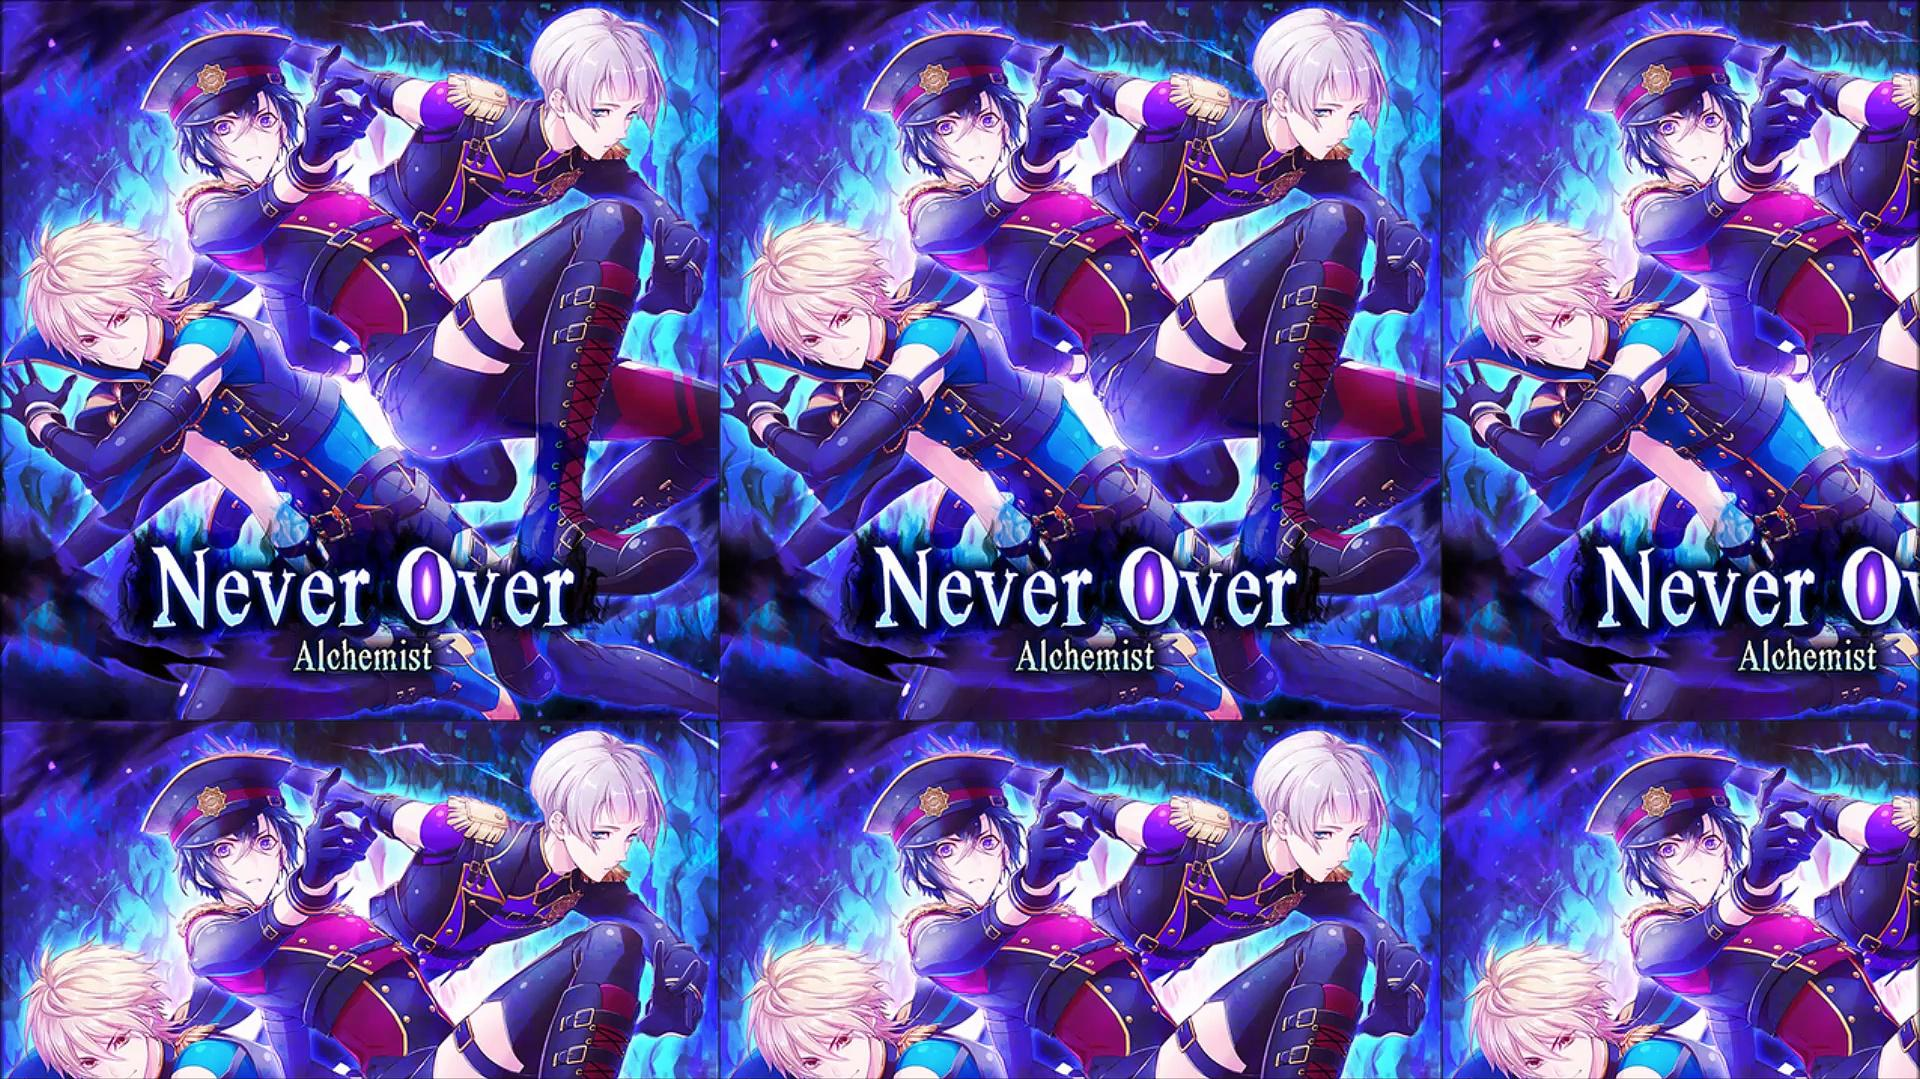 Alchemist - Never Over